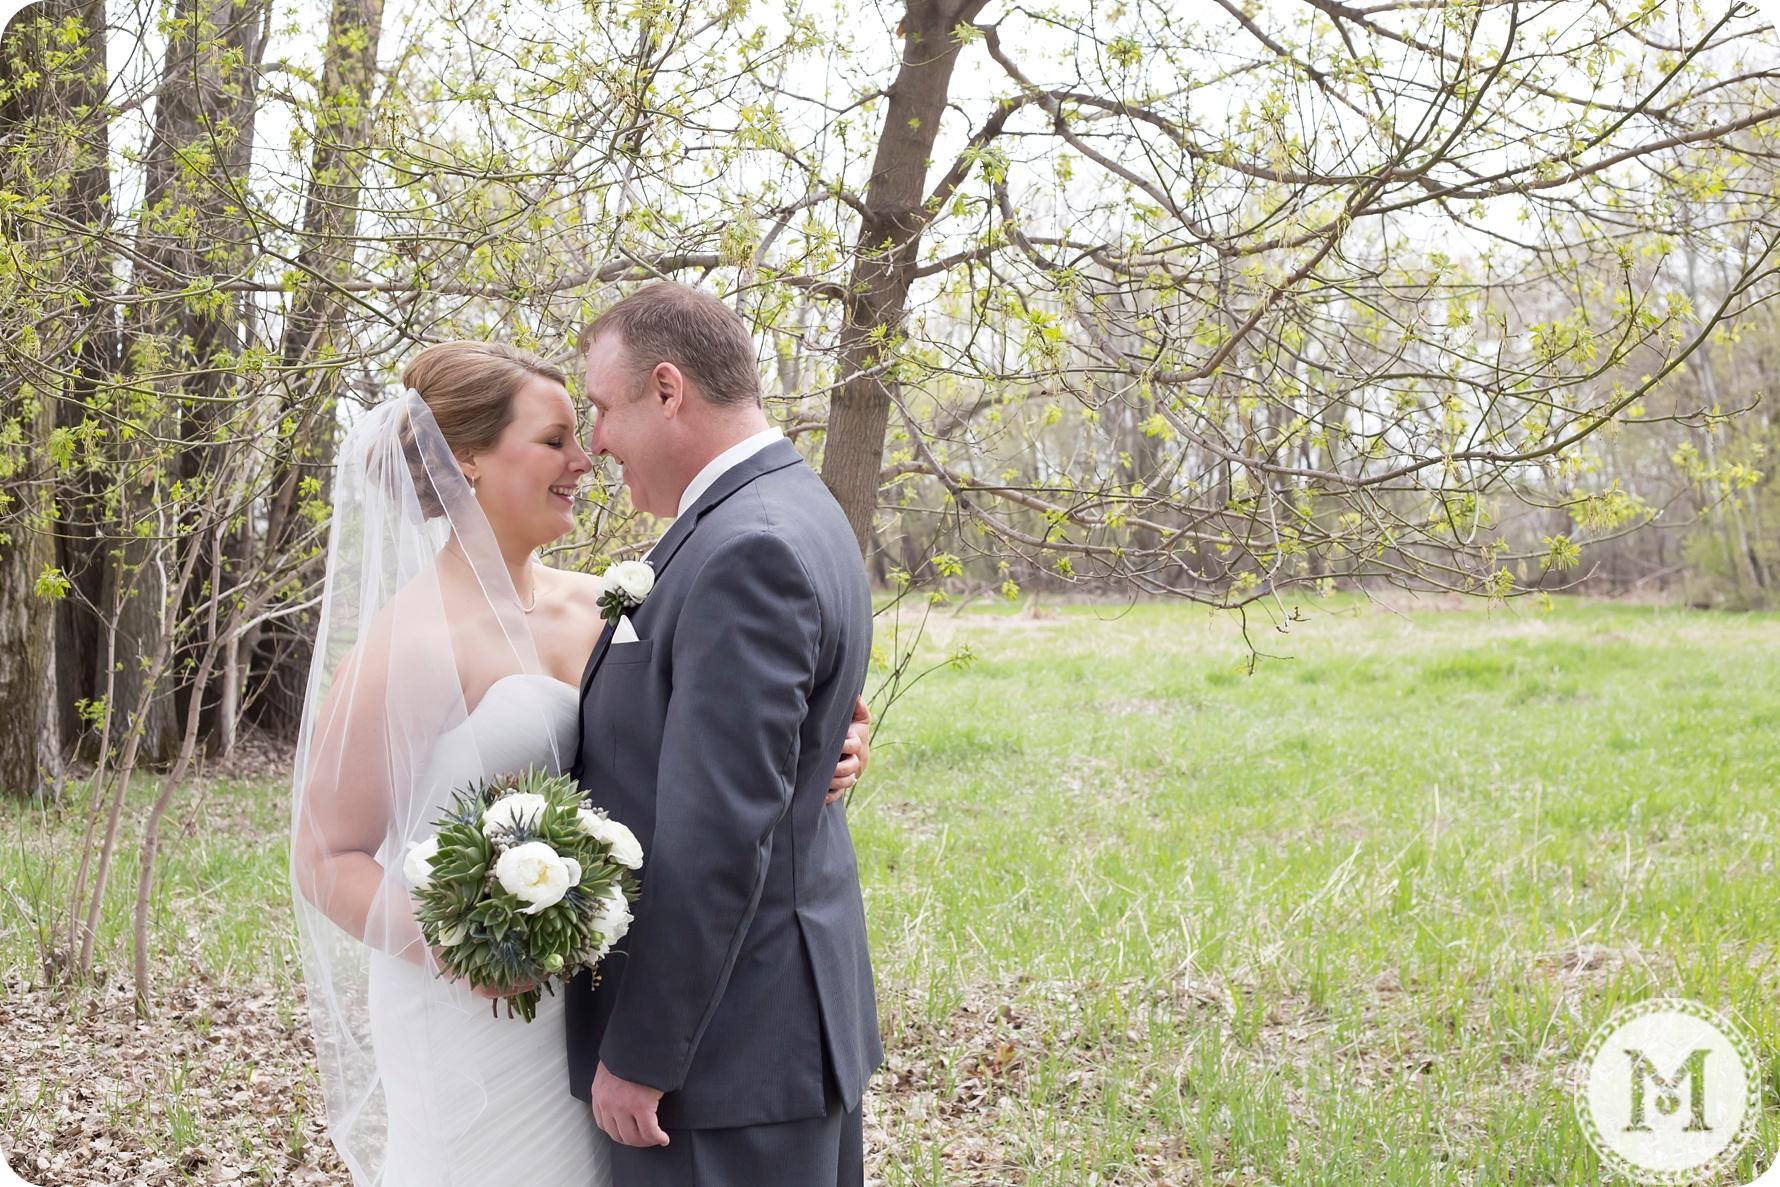 mckenziesmithphotography.com_0182